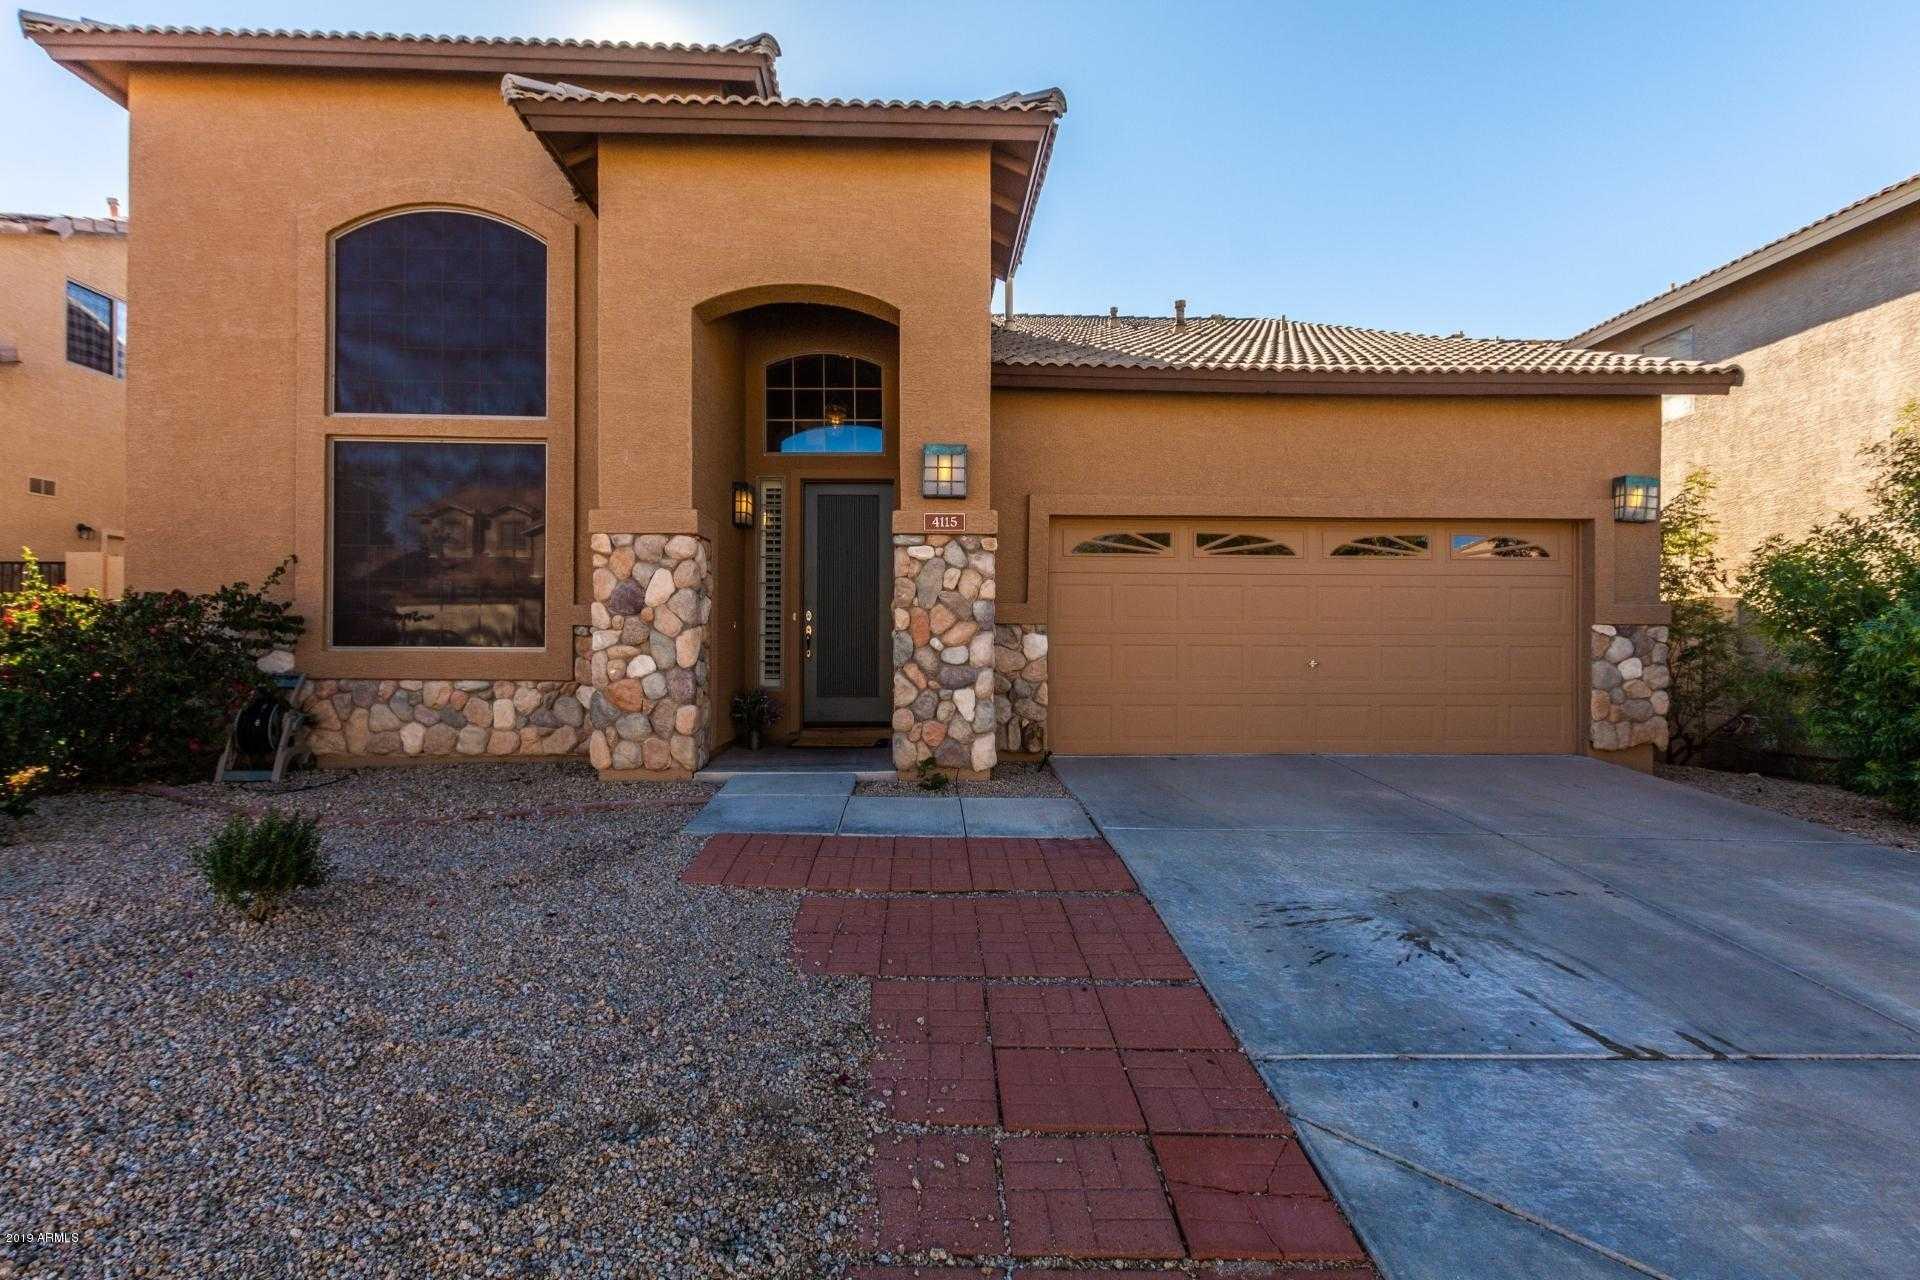 $475,000 - 4Br/3Ba - Home for Sale in Tatum Highlands Parcel 22a, Phoenix